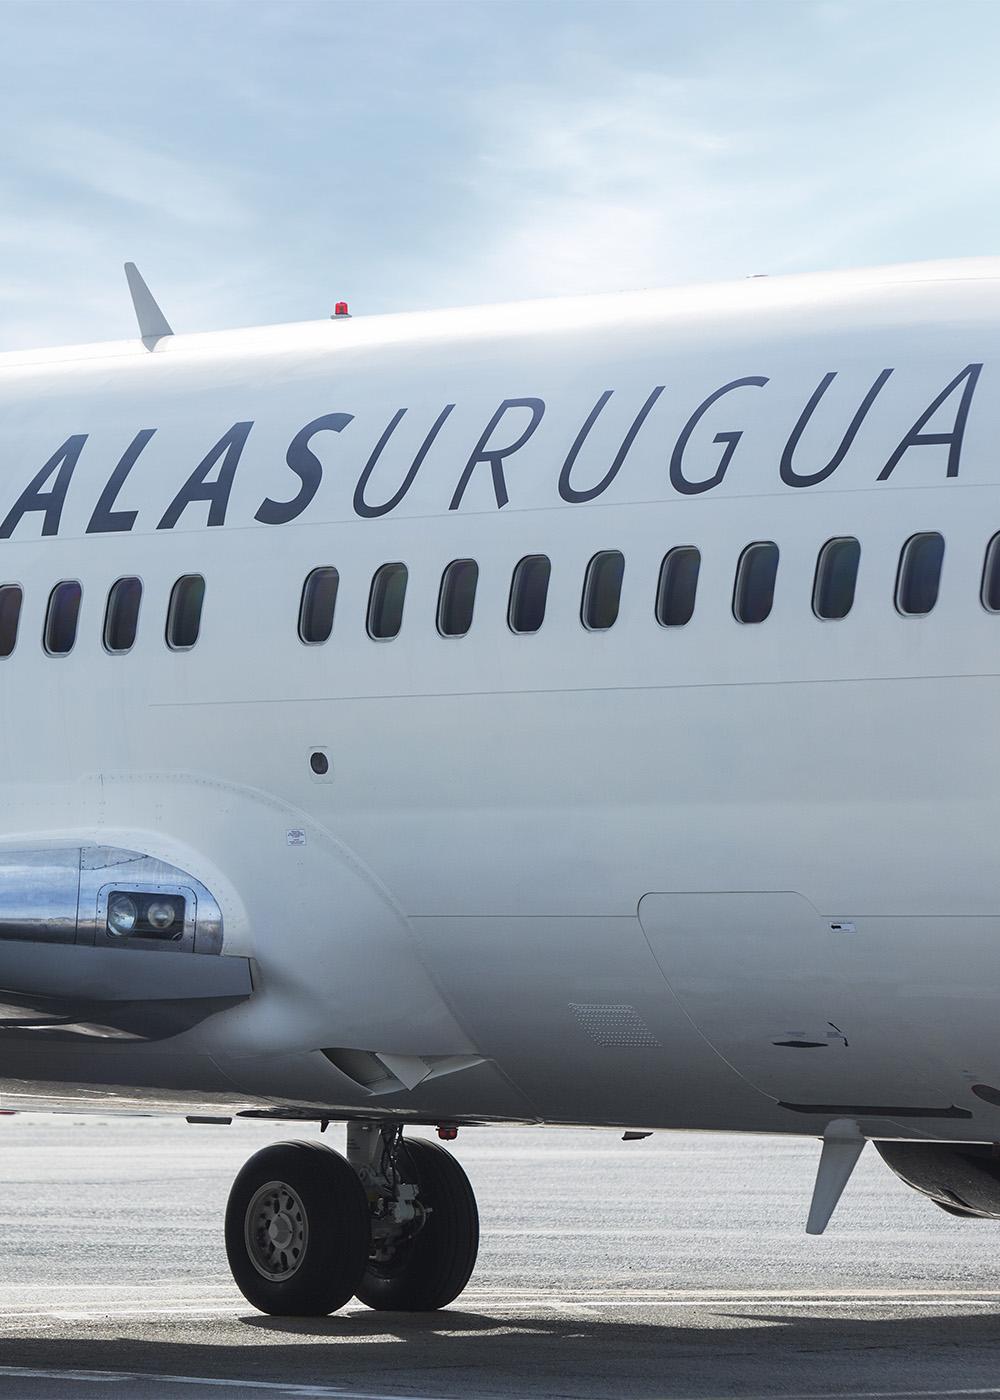 Aras Uraguaya